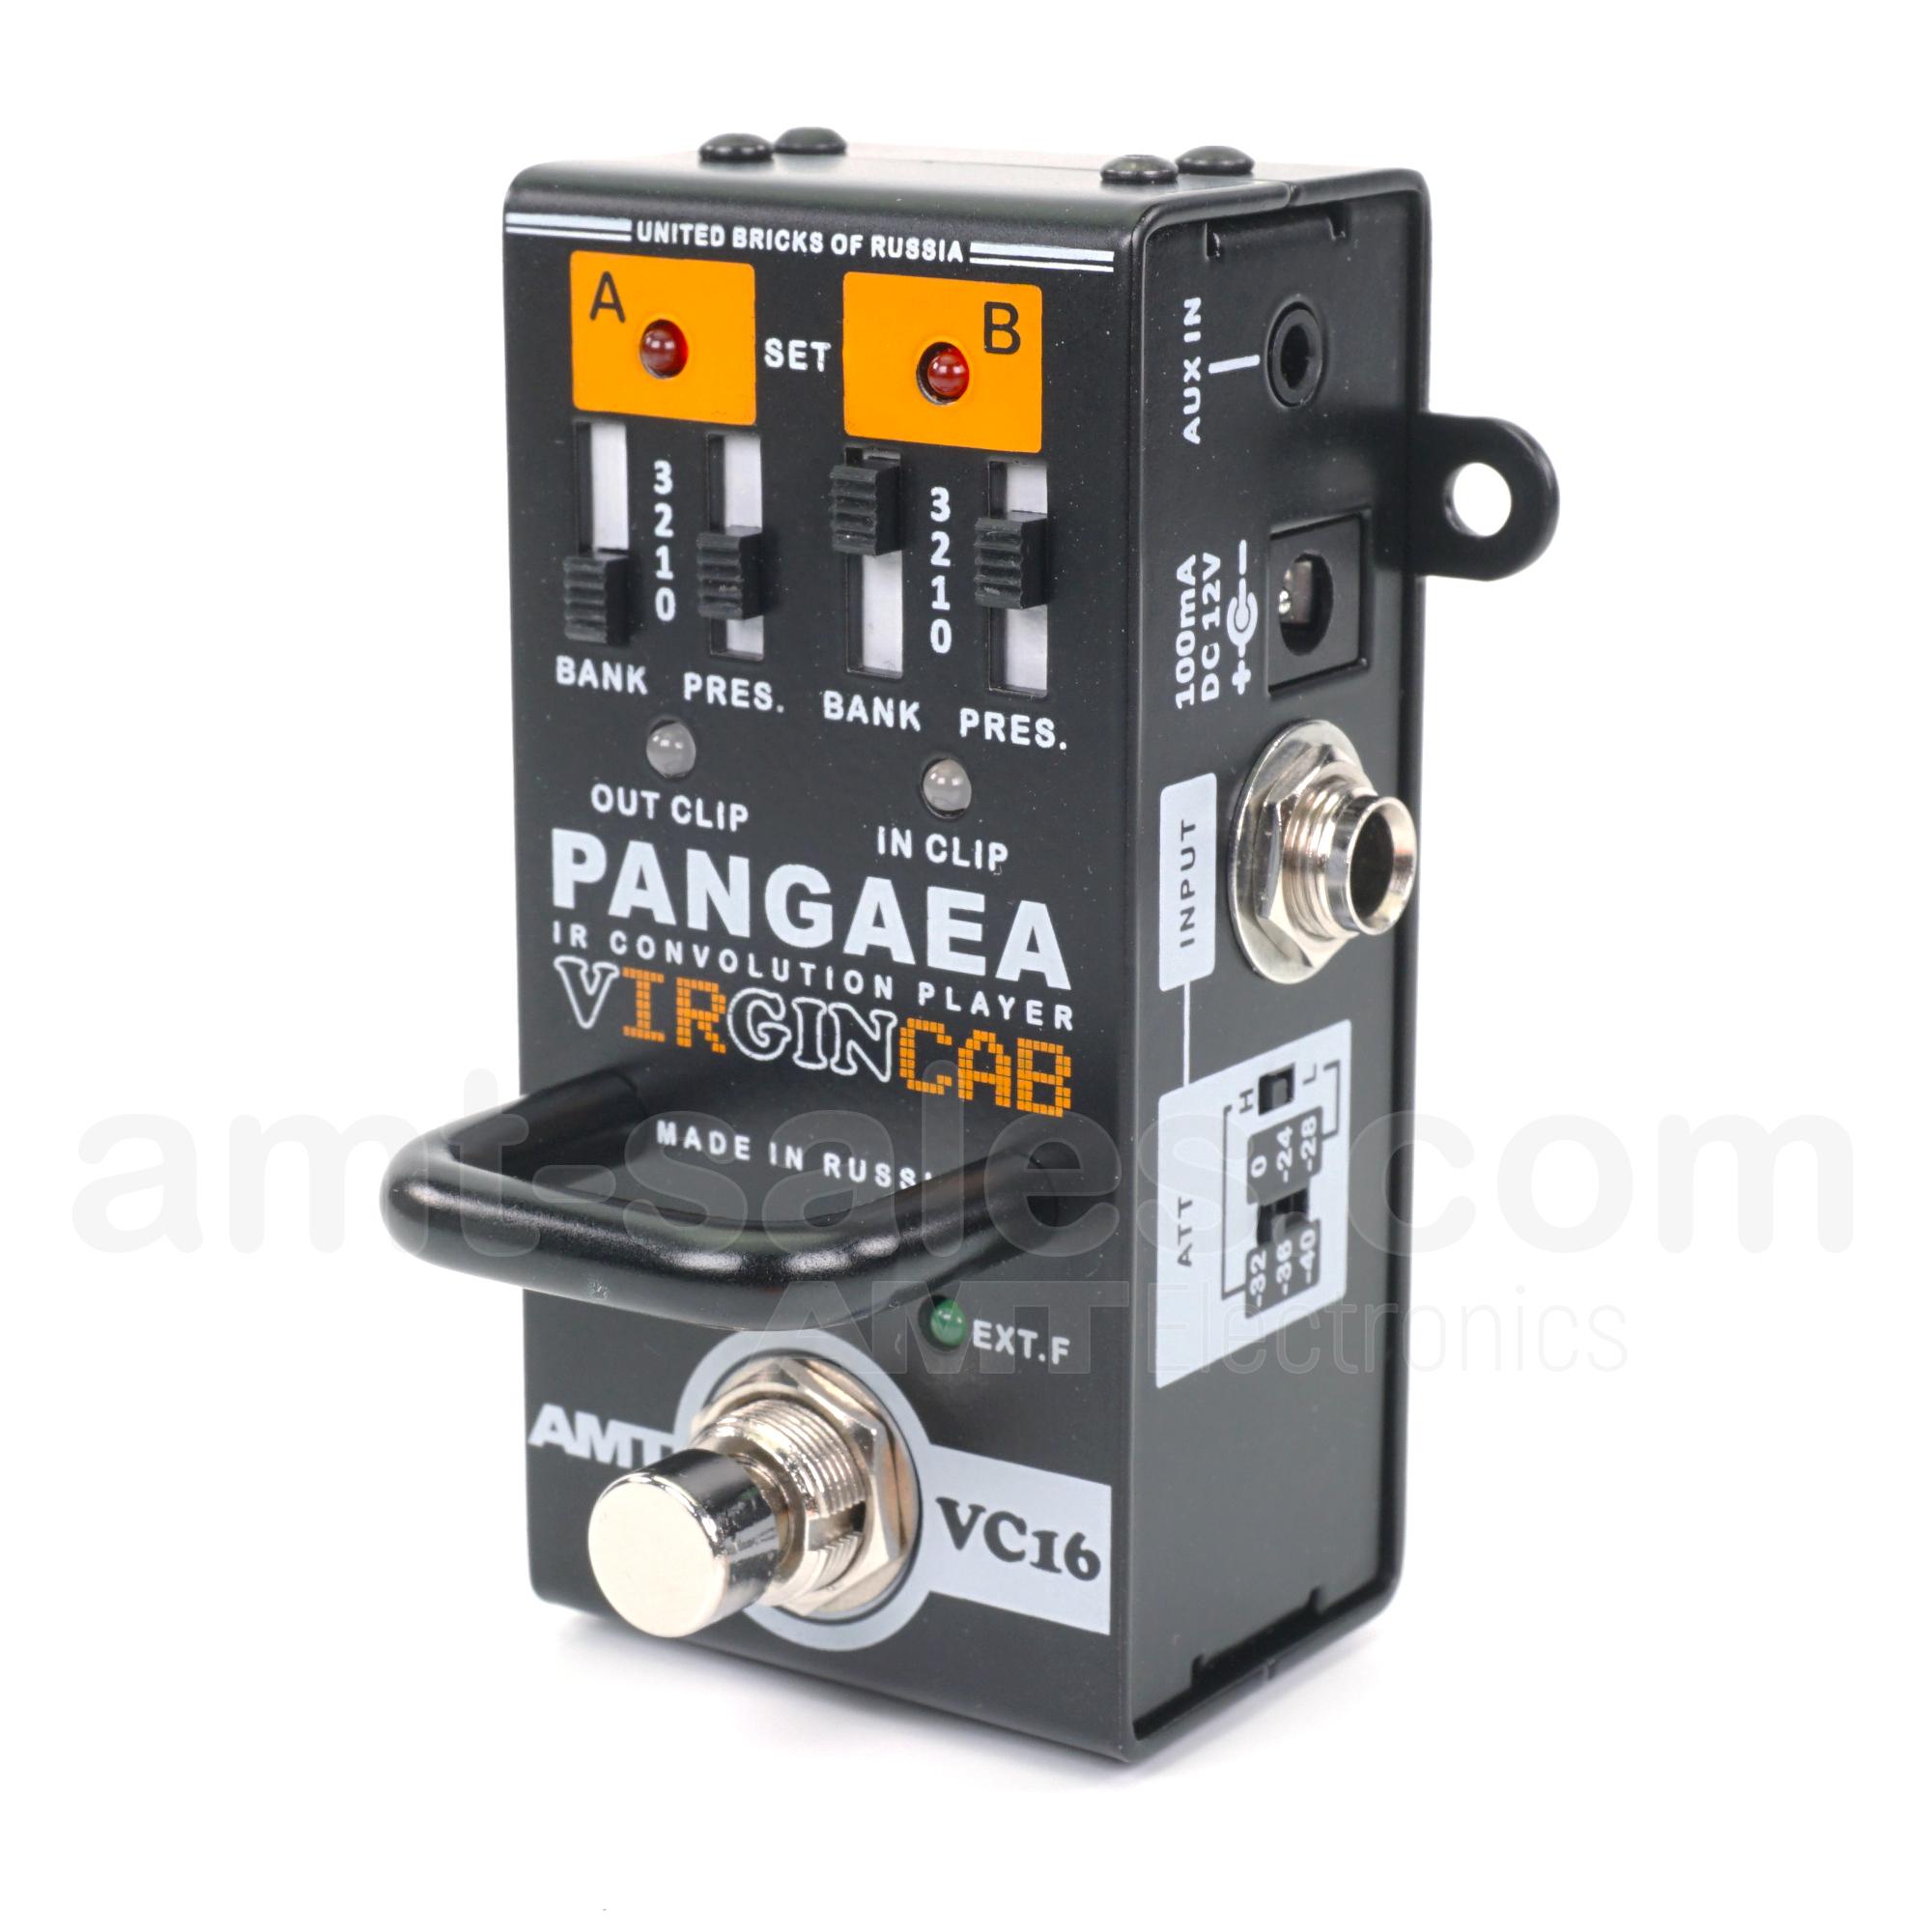 AMT Pangaea VIRGINCAB VC-16